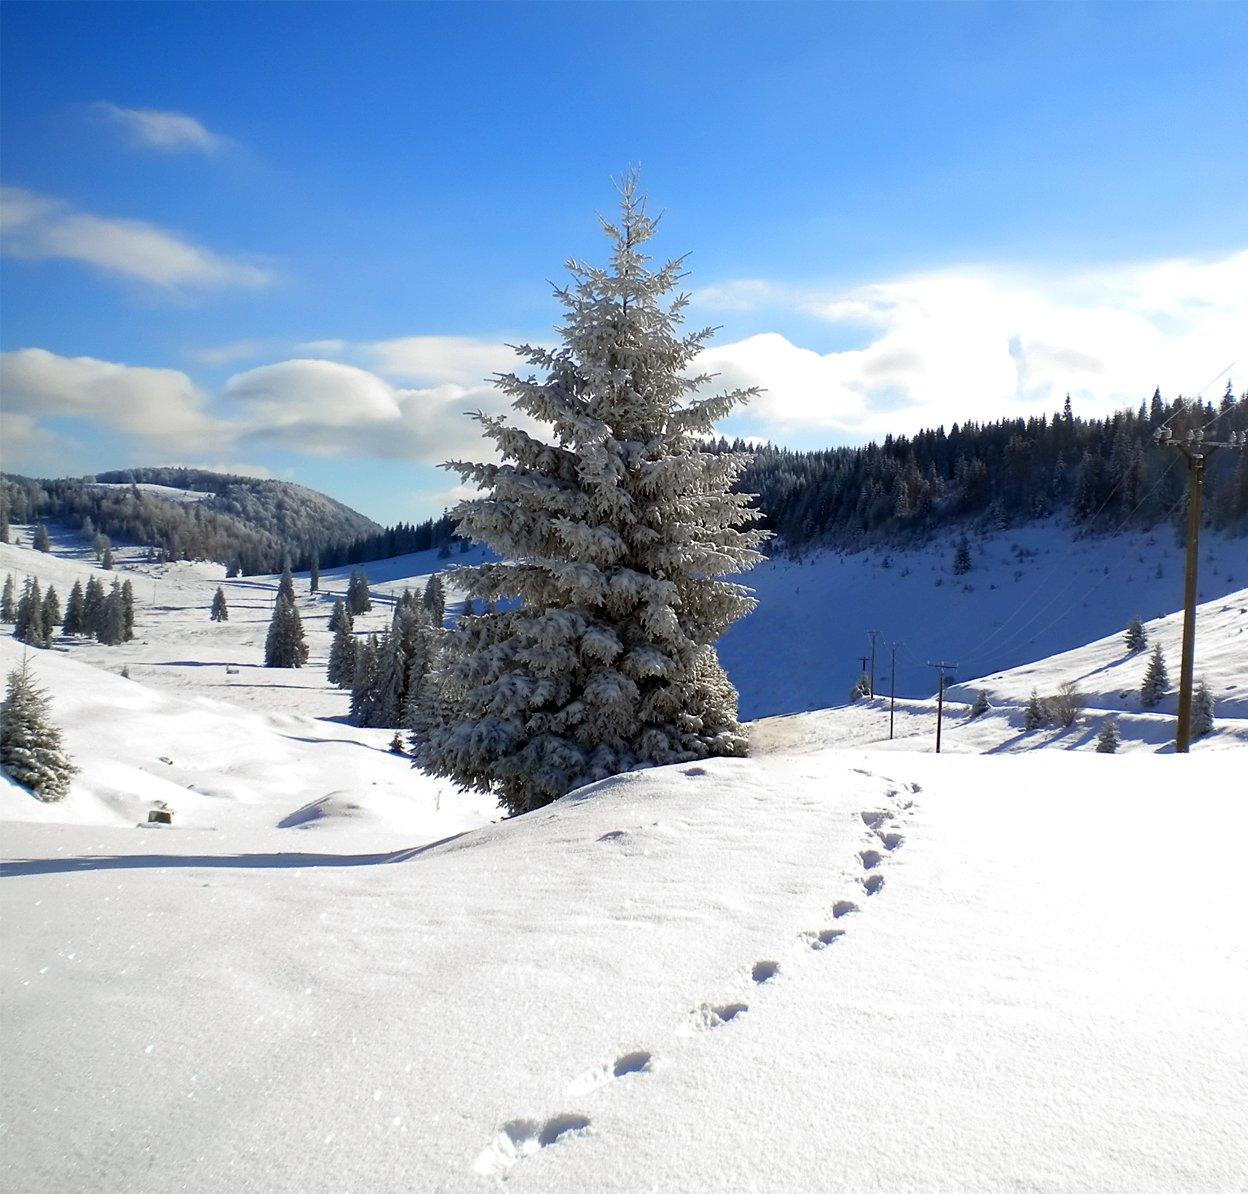 Iarna in Padis